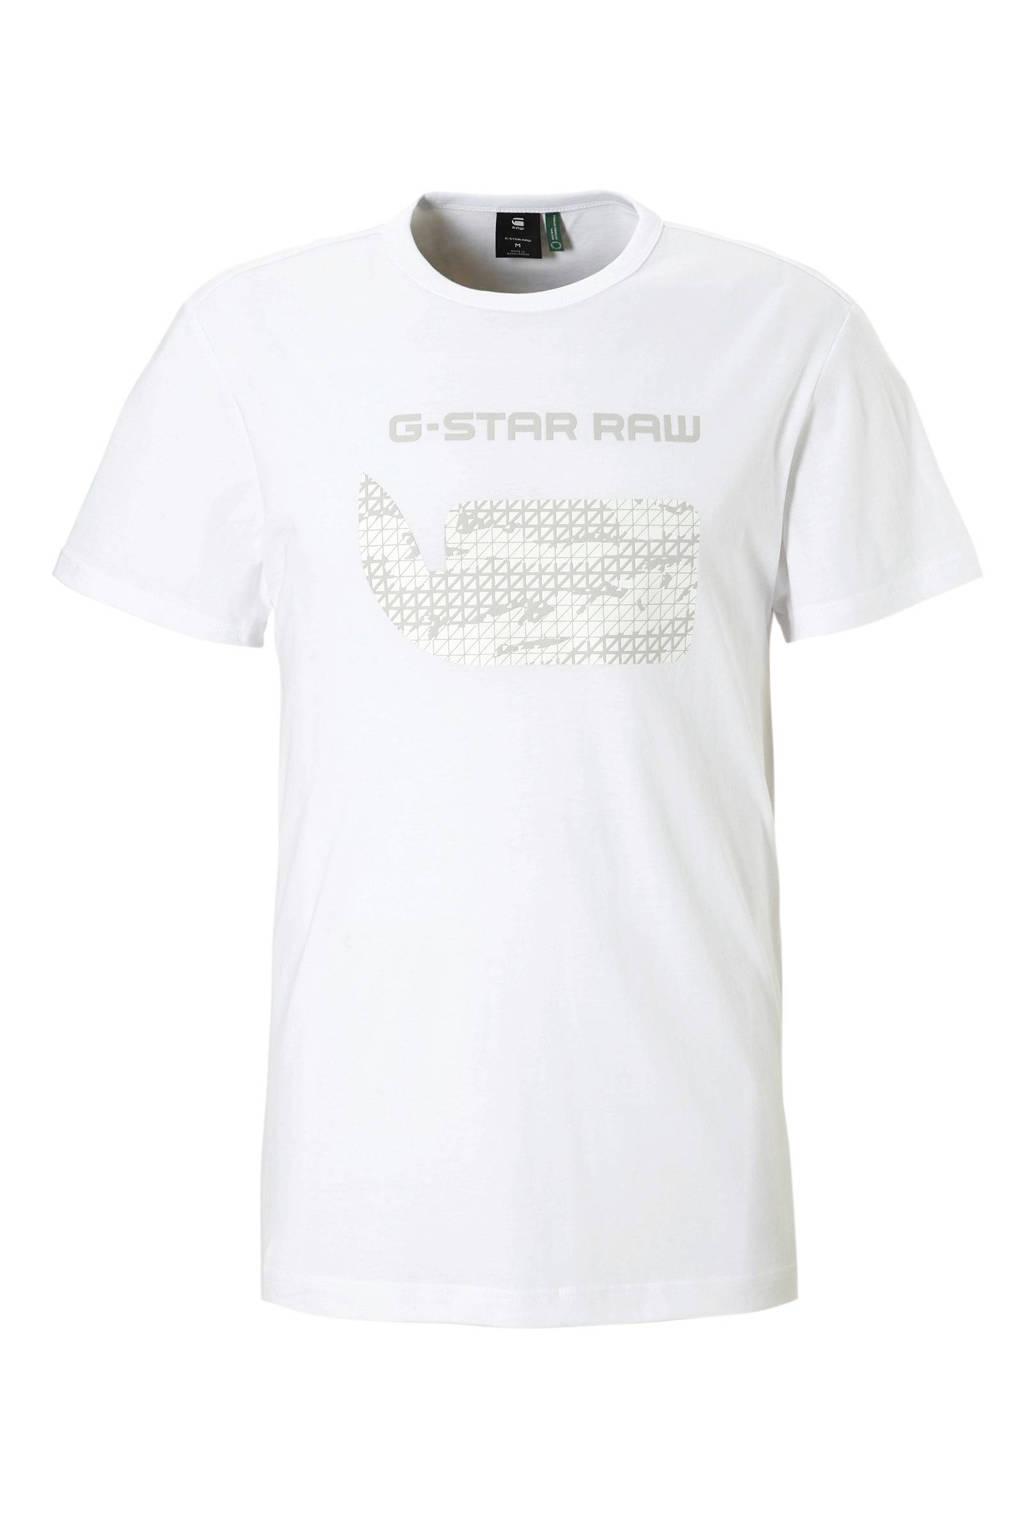 G-Star RAW T-shirt, Wit